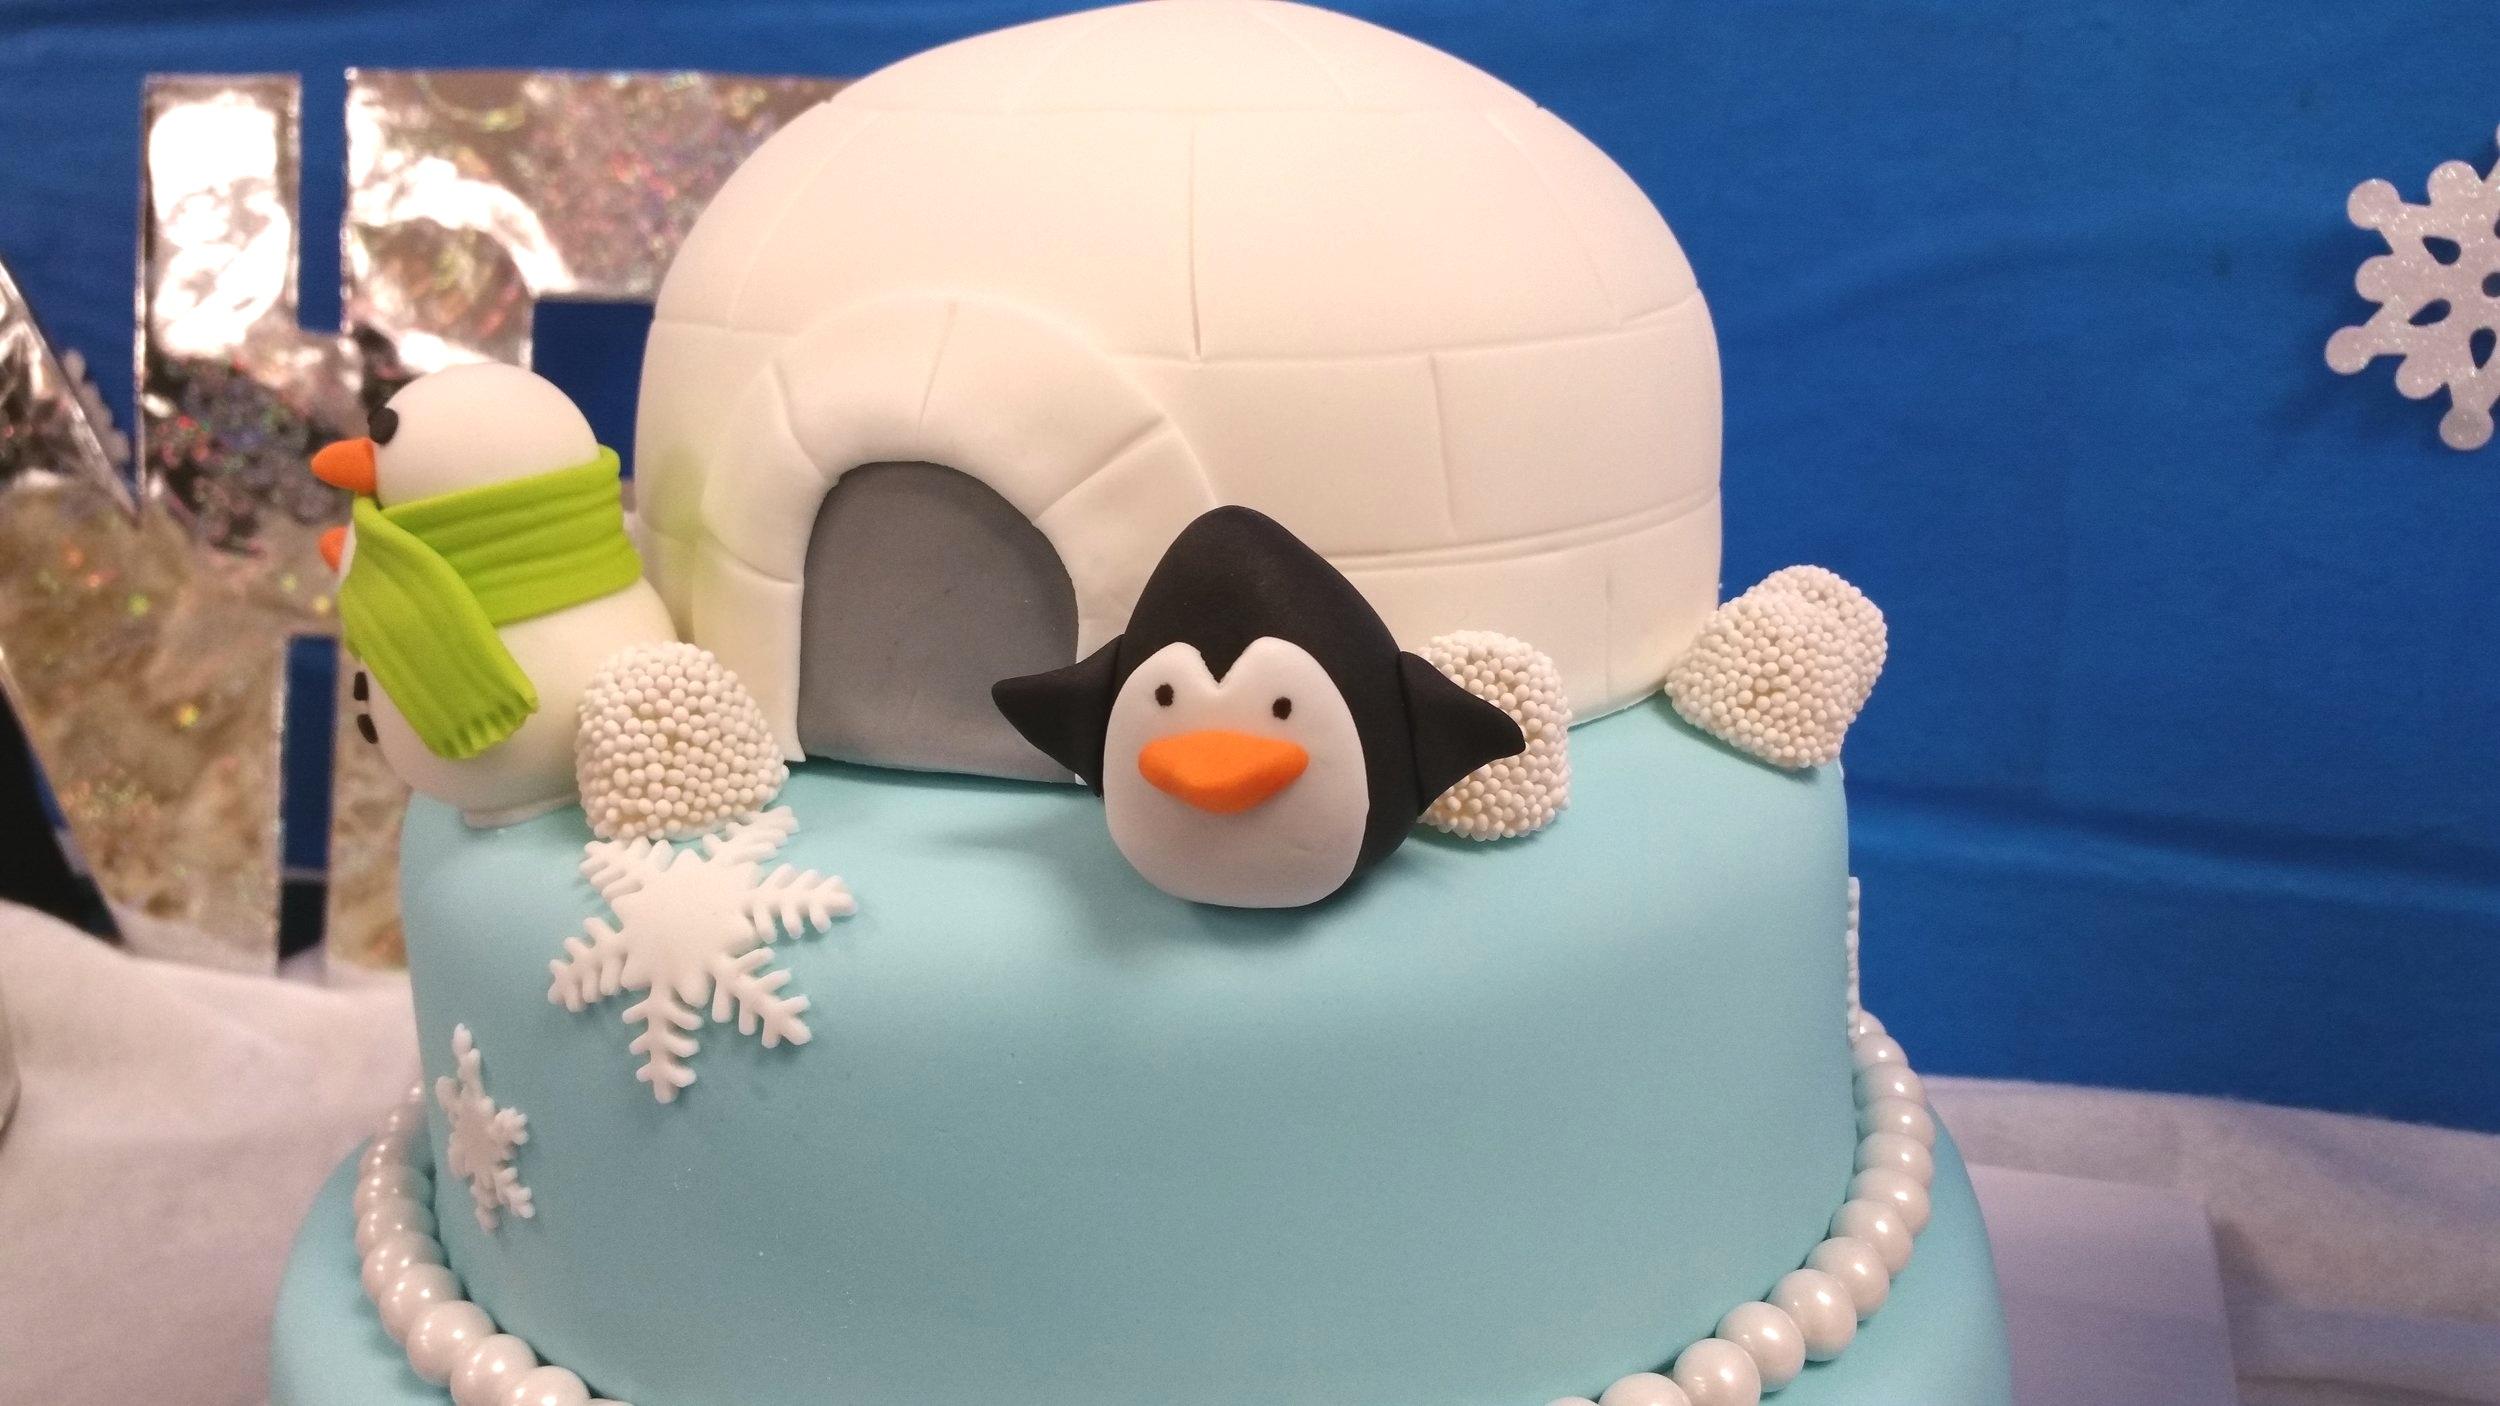 Igloo+cake+penquin+smowman+fondant+birthday+cake+jellybeantrail.jpg